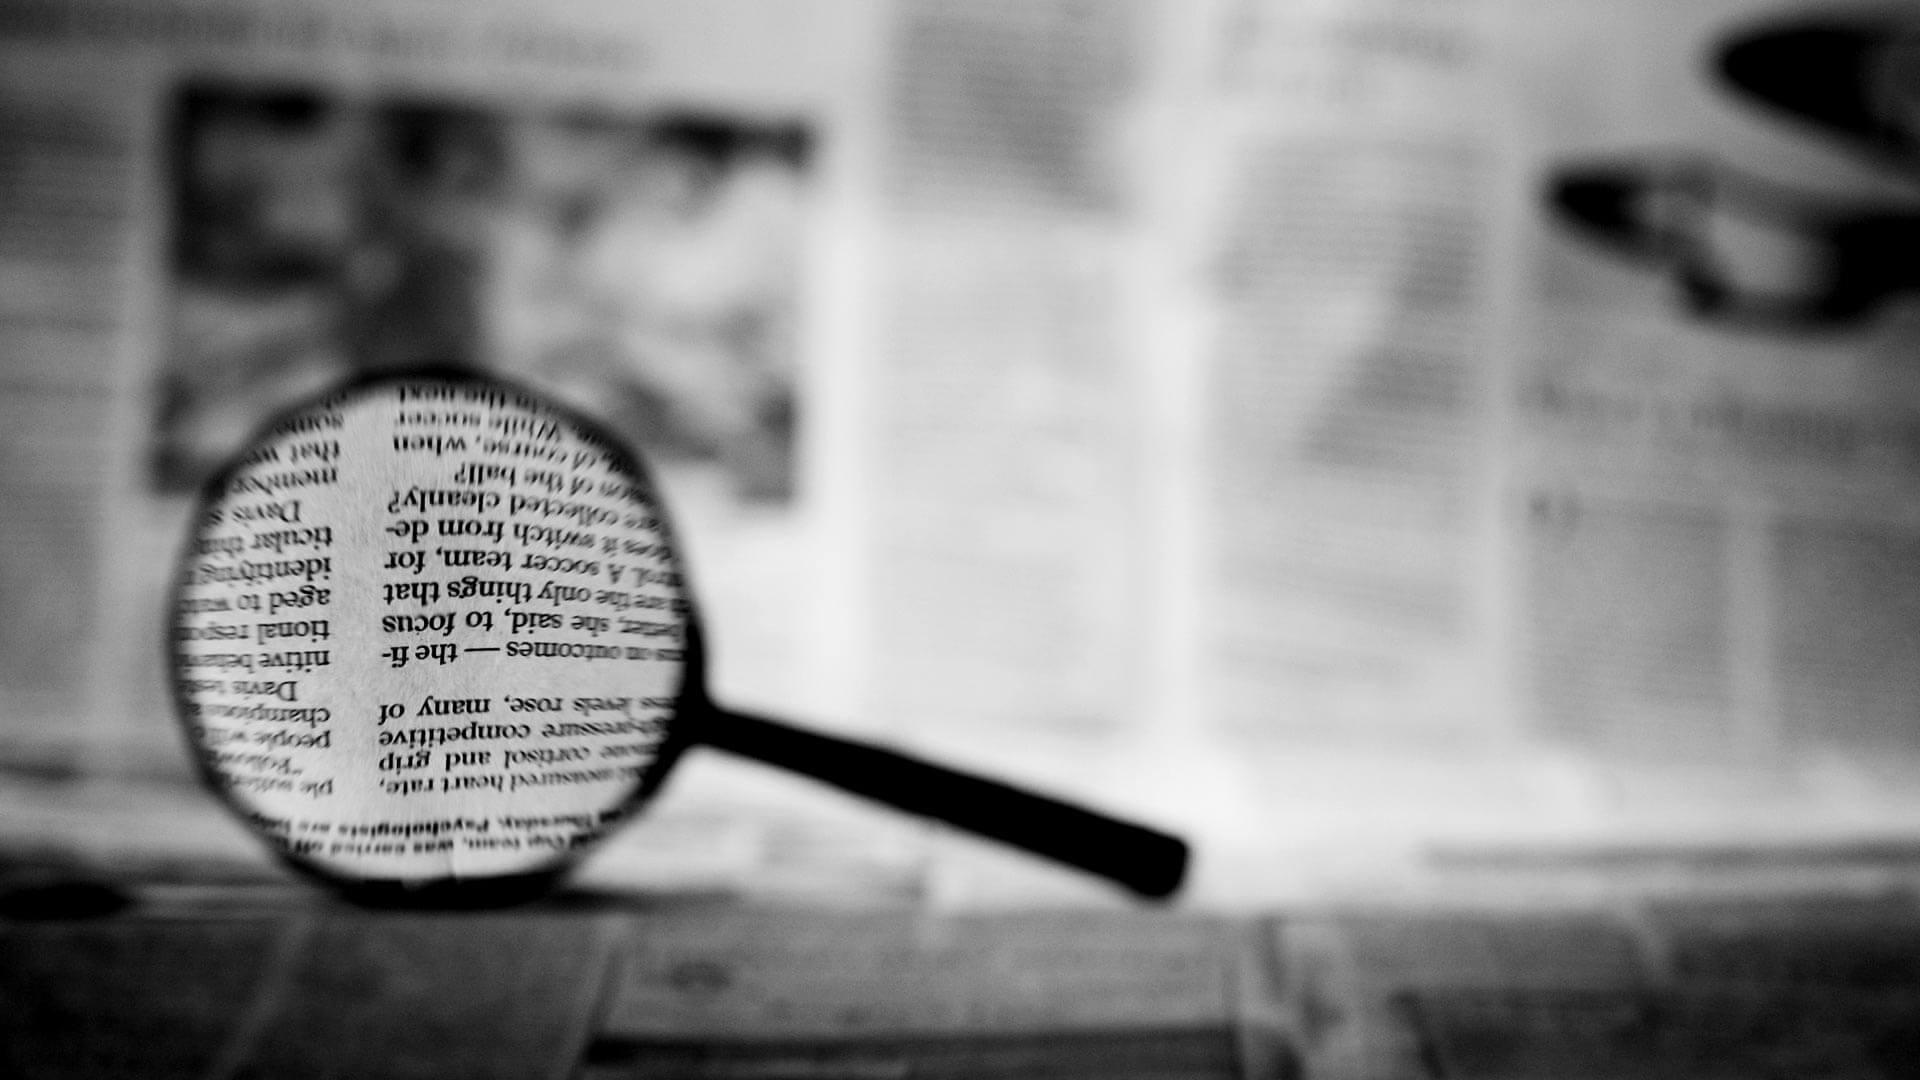 singularityhub.com - Thomas Hornigold - Follow the Data? Investigative Journalism in the Age of Algorithms